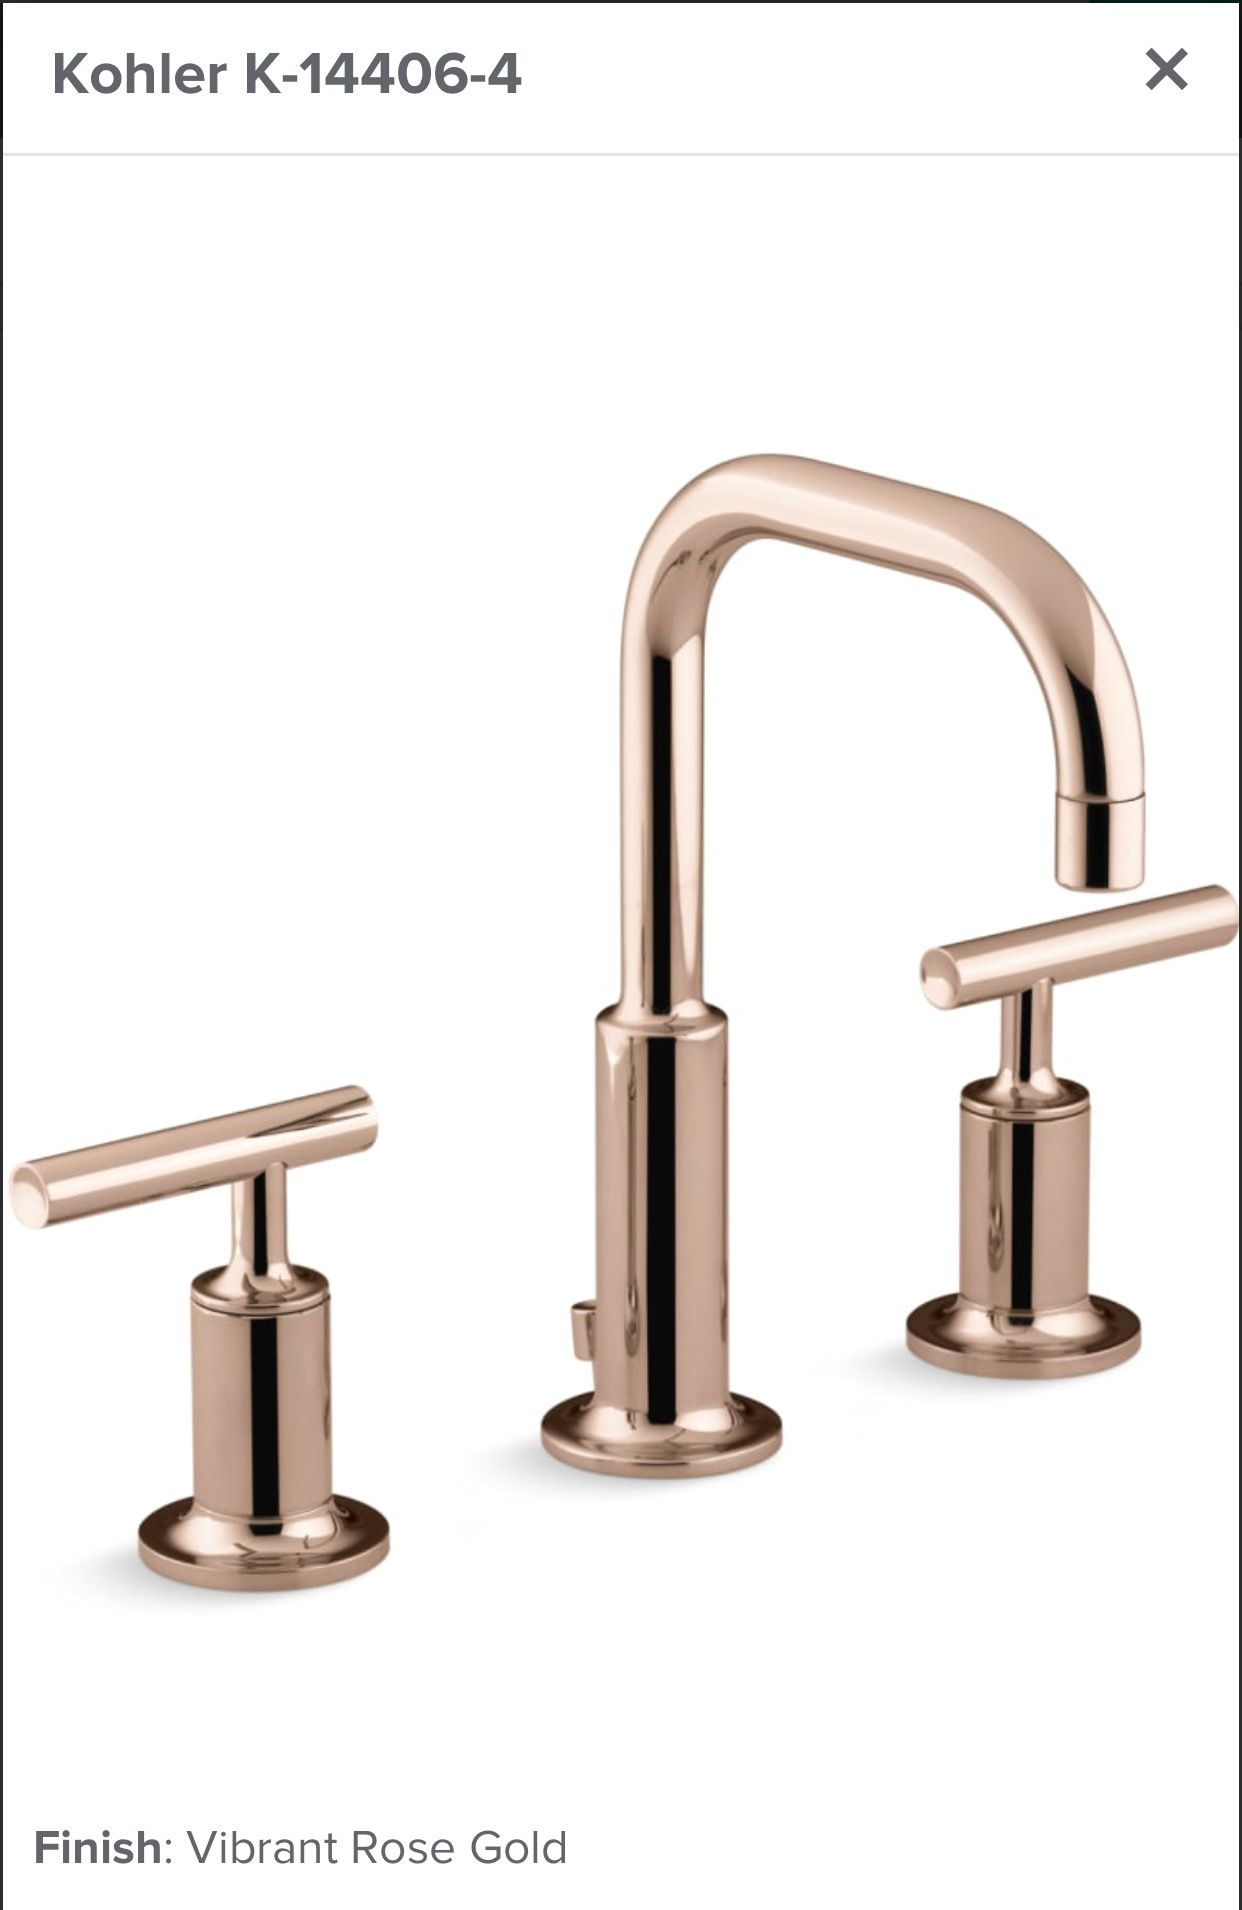 Kohler Purist In Vibrant Rose Gold Finish Bathroom Faucets